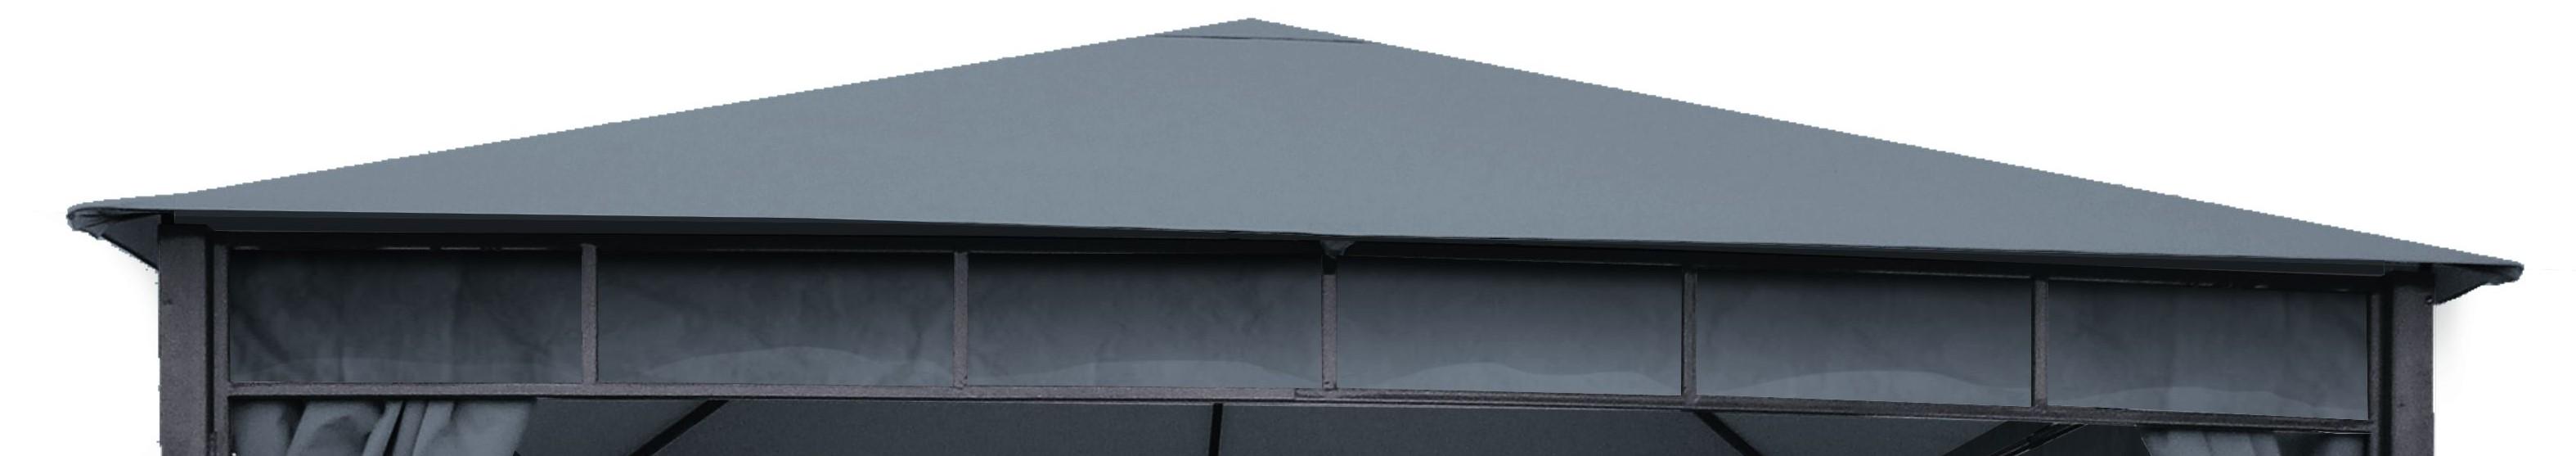 Ersatzdach zu Pavillon Modern Bellavista anthrazit Bild 1